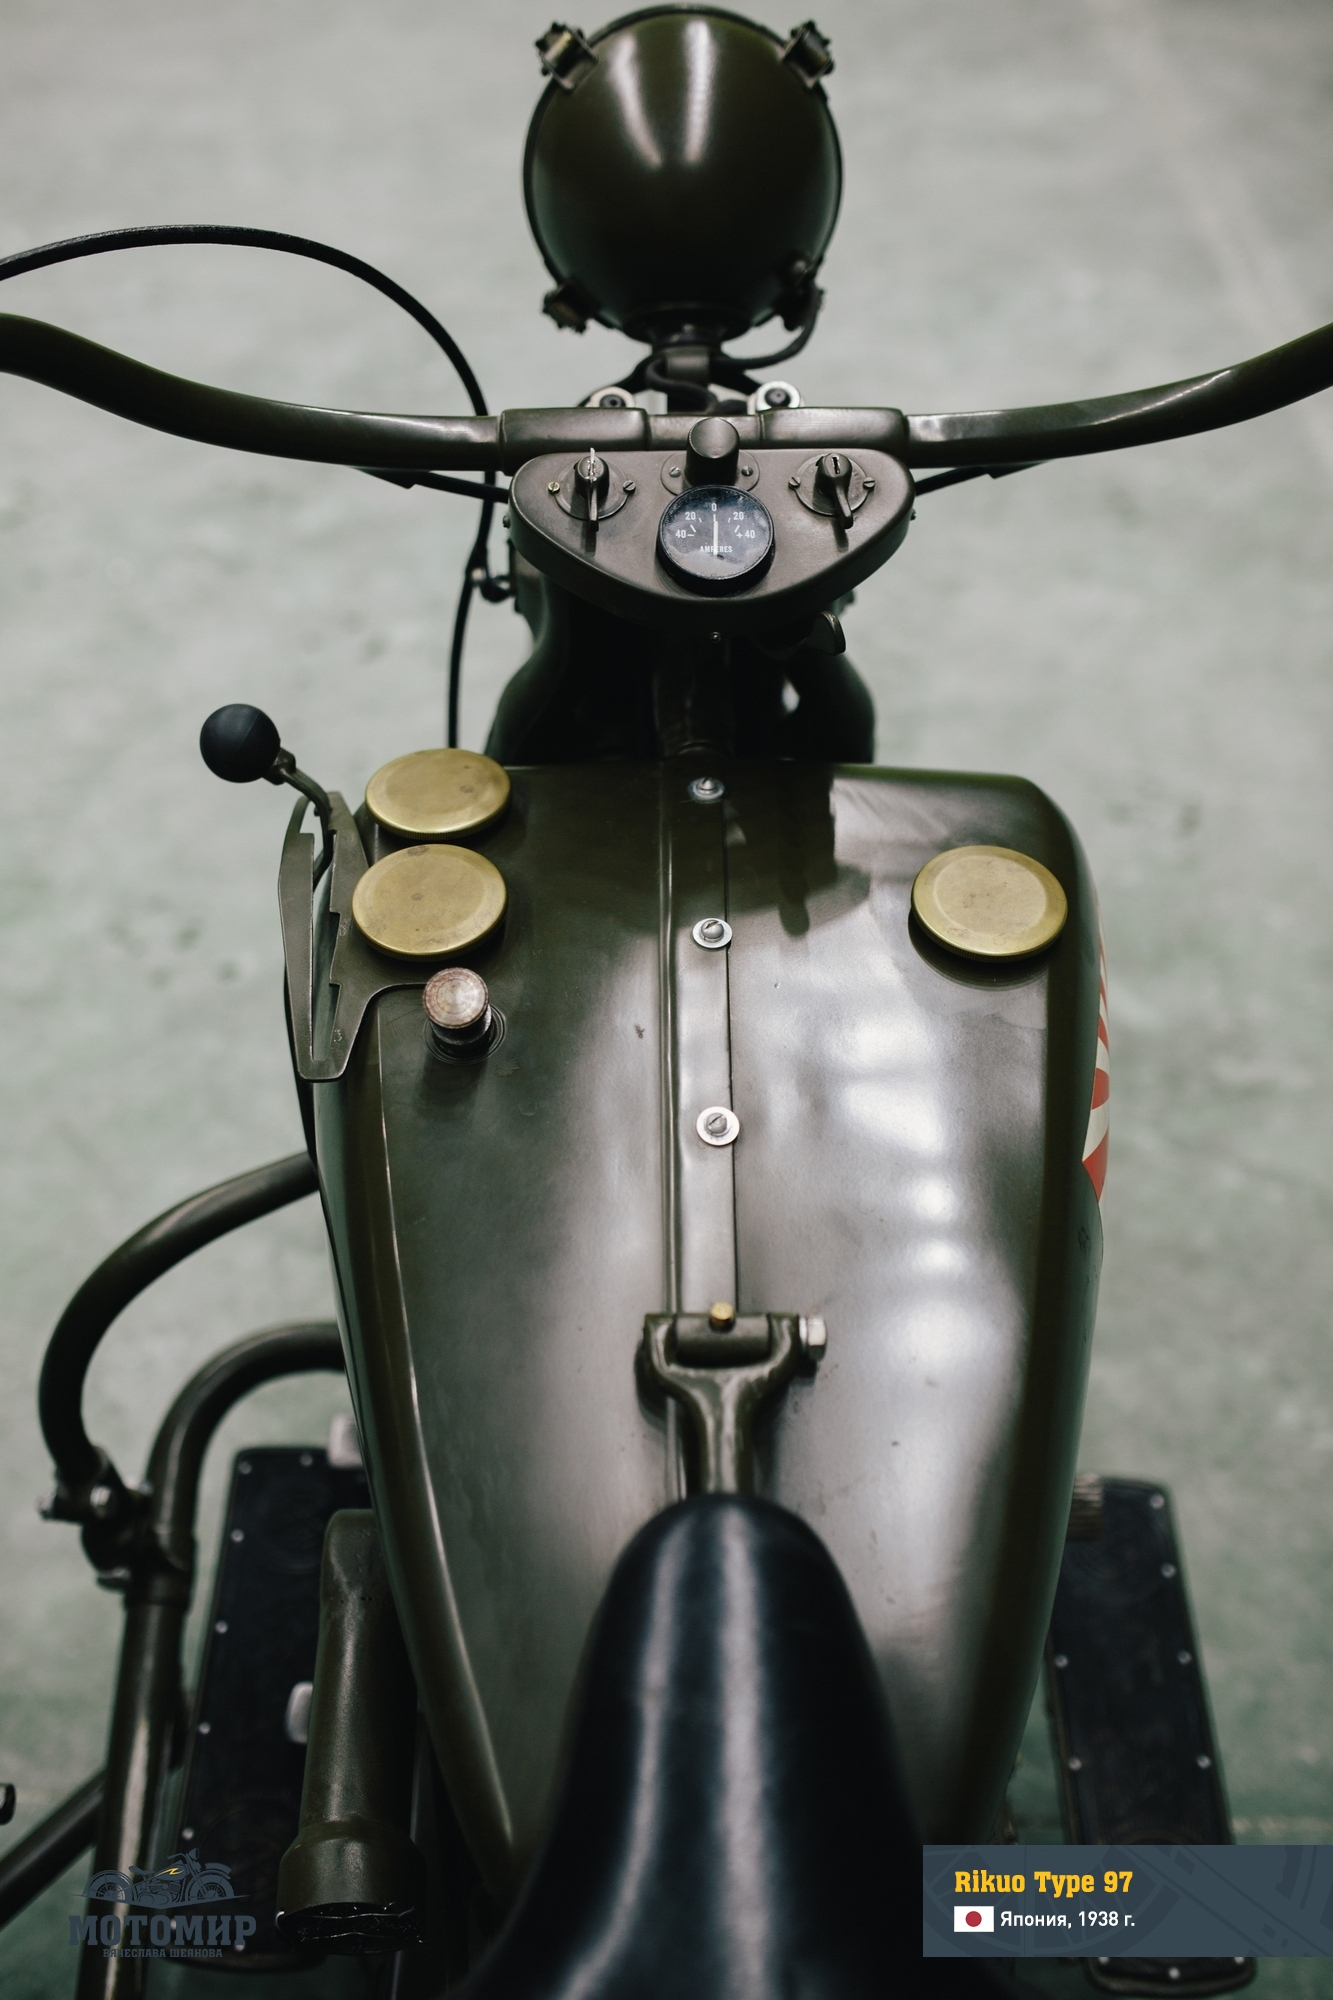 rikuo-type-97-1938-201502-web-18